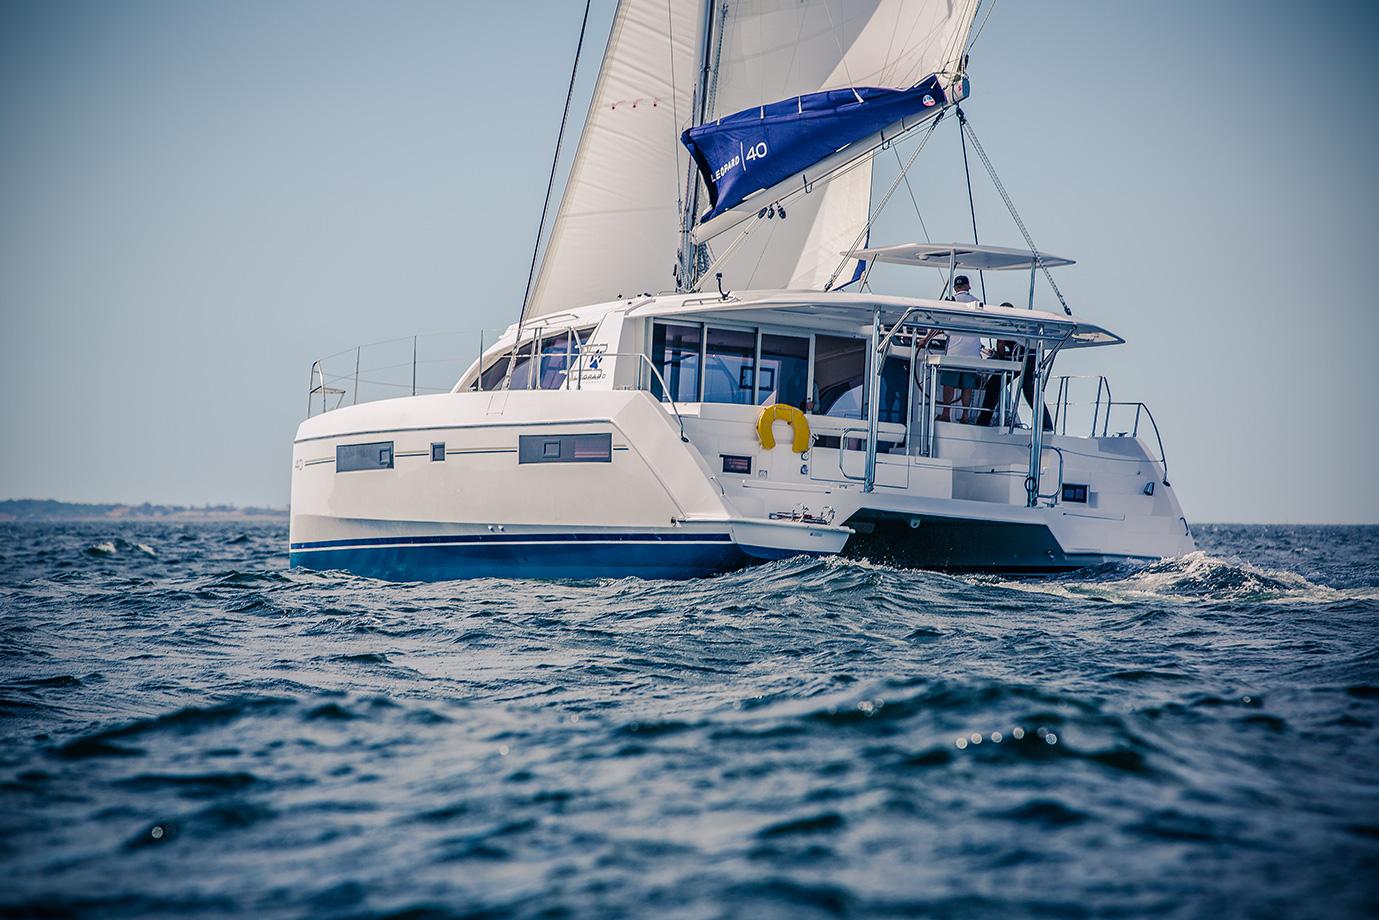 Leopard 40 Catamaran Sailing Photography - Nautique.tv